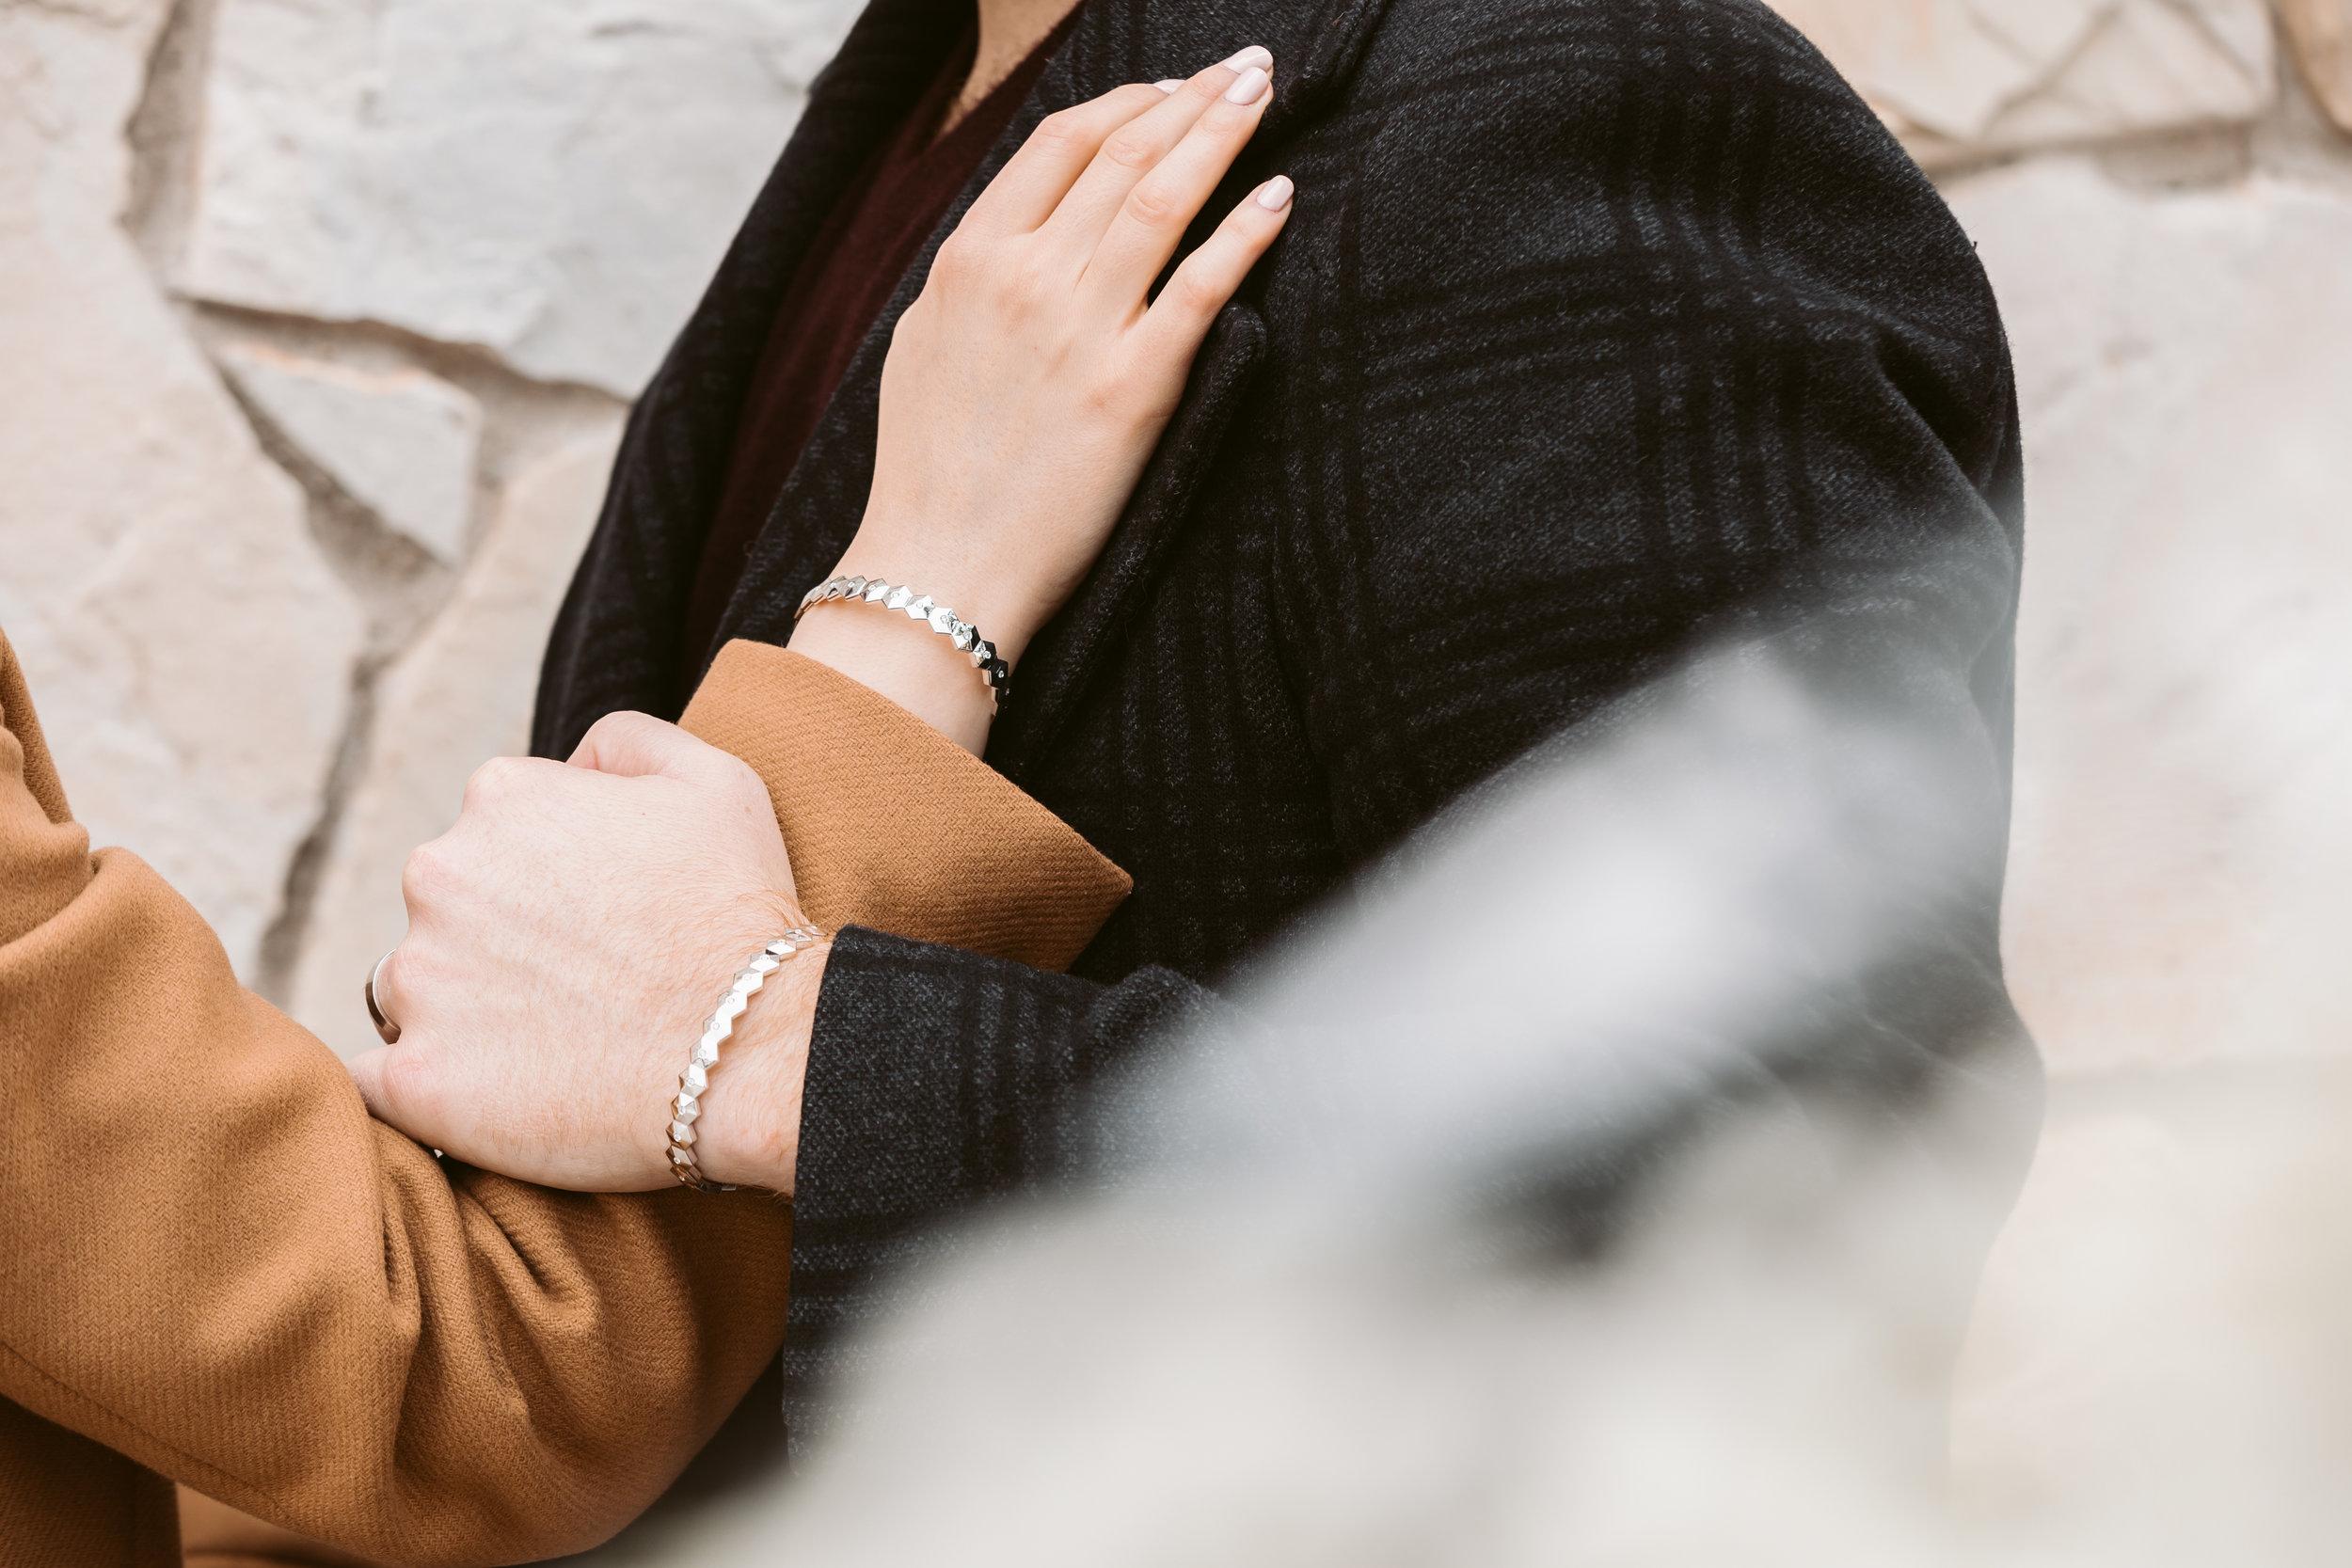 ABE1_Marioni_Jewelry_Lifestyle-51.jpg